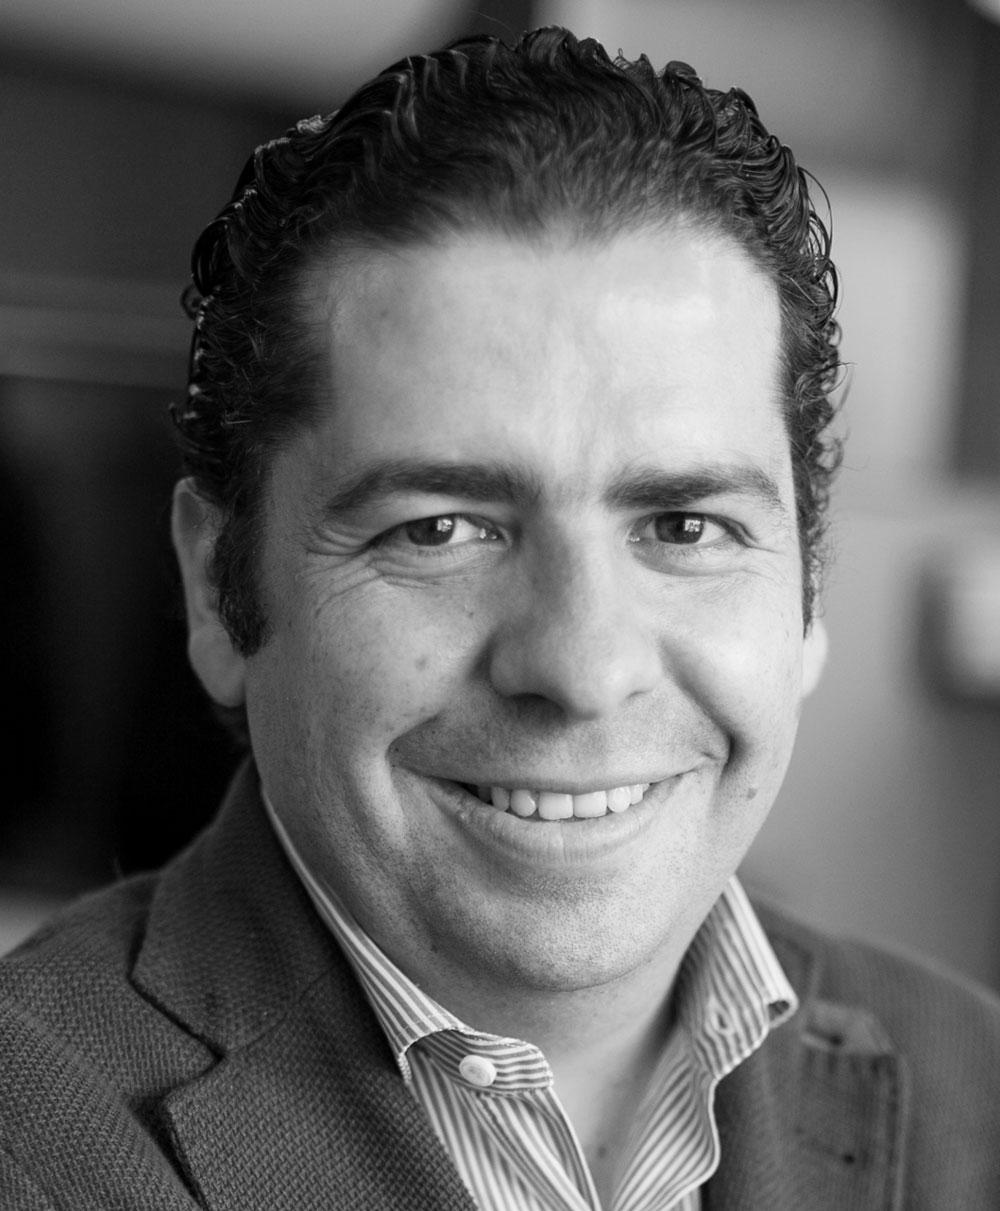 Headshot of Bernardo Ortiz